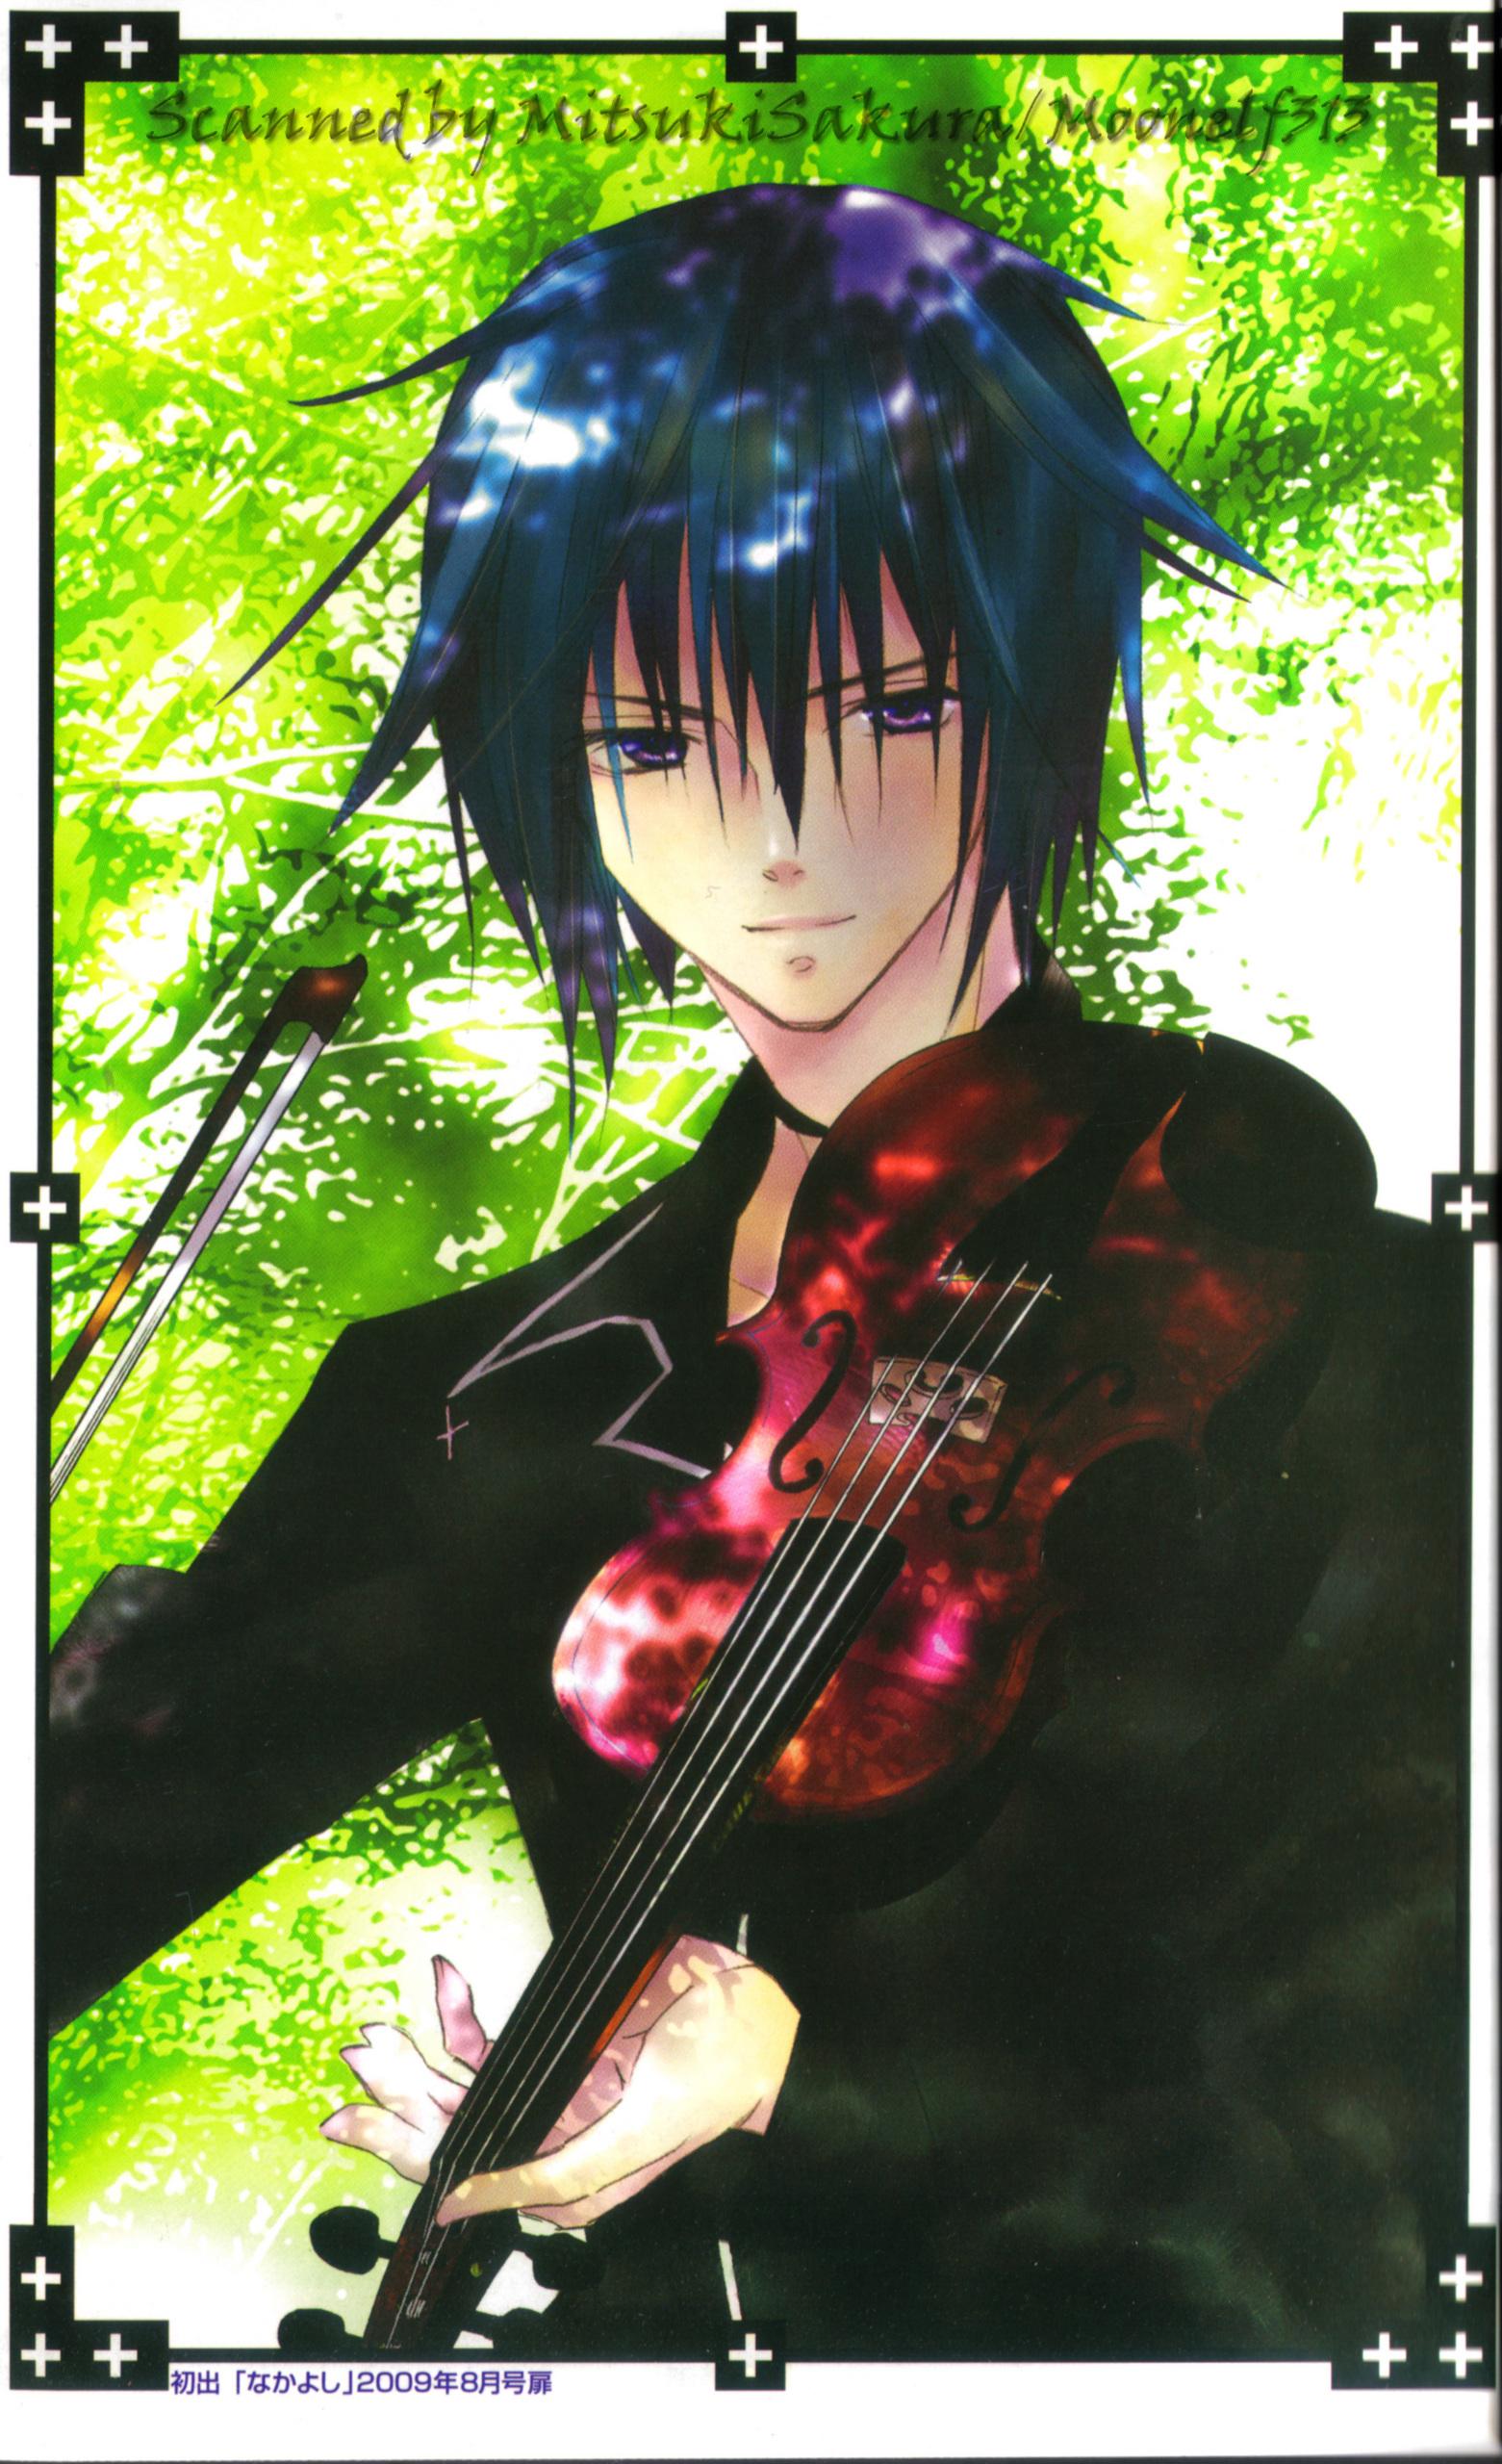 http://images2.fanpop.com/image/photos/9400000/Ikuto-ikuto-tsukiyomi-fanclub-9480860-1561-2560.jpg